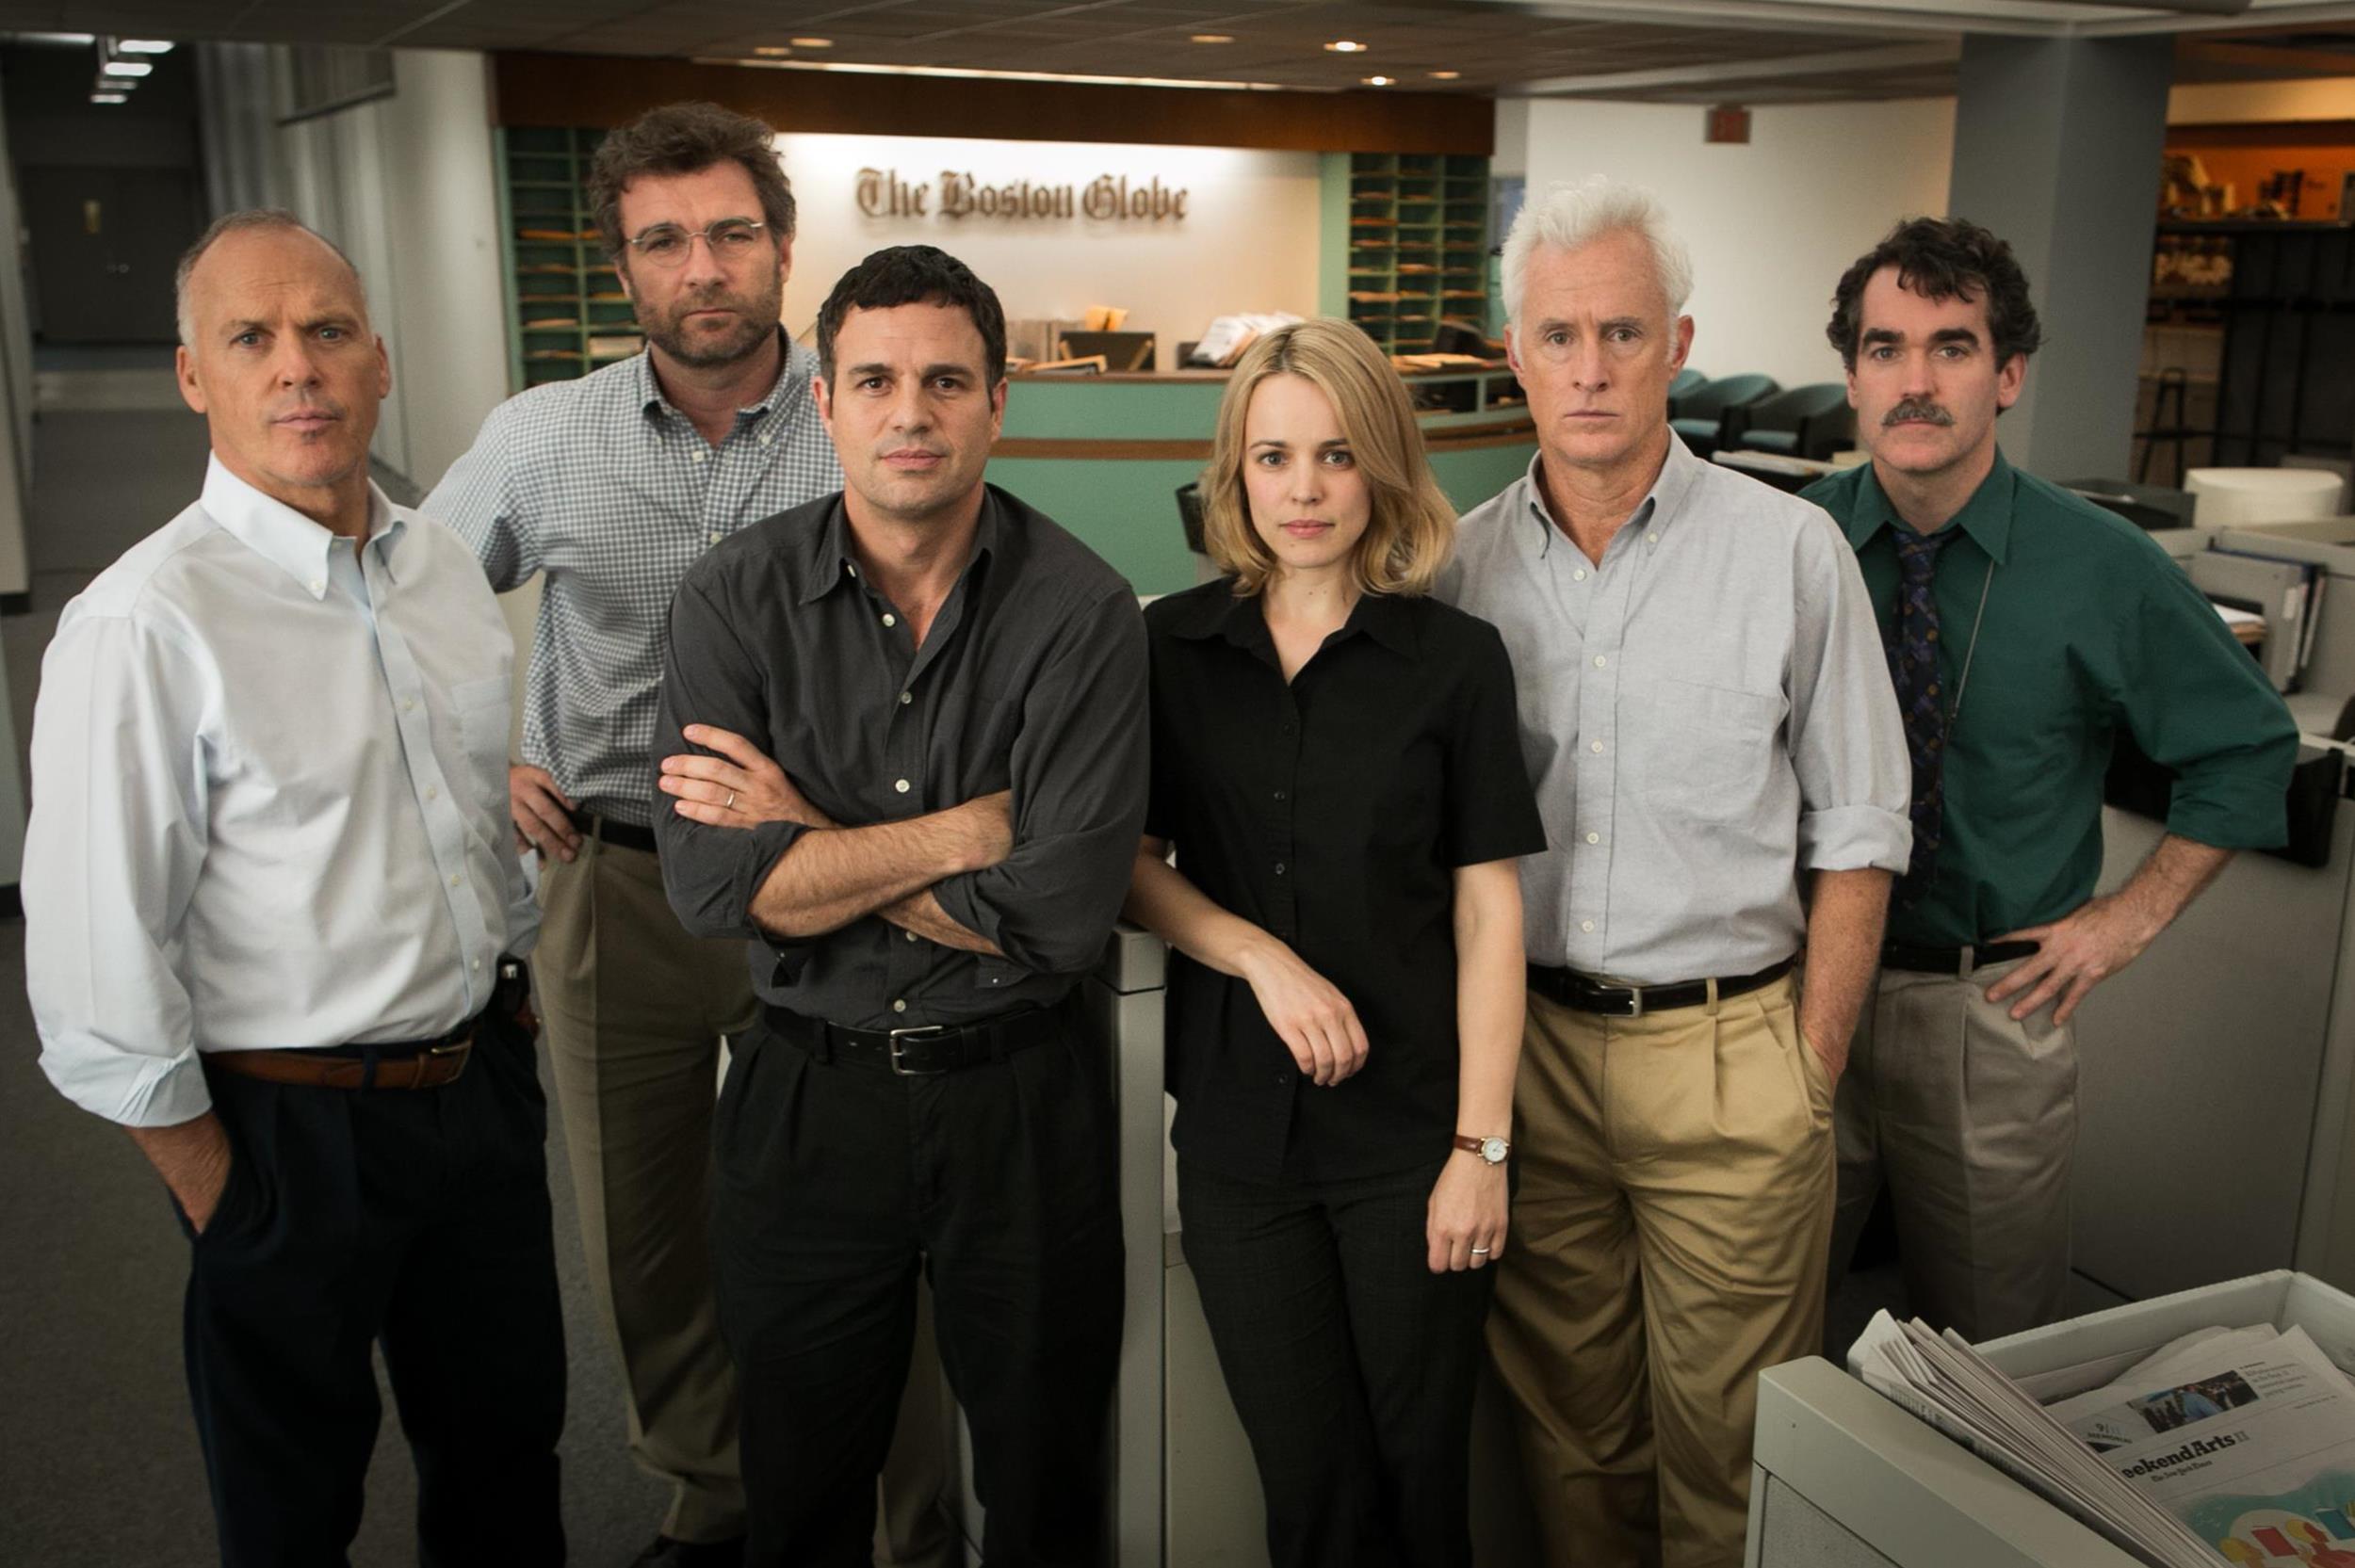 (l to r) Liev Schreiber, Mark Ruffalo, Rachel McAdam, John Slattery, Brian D'Arcy James (courtesy of Open Road)